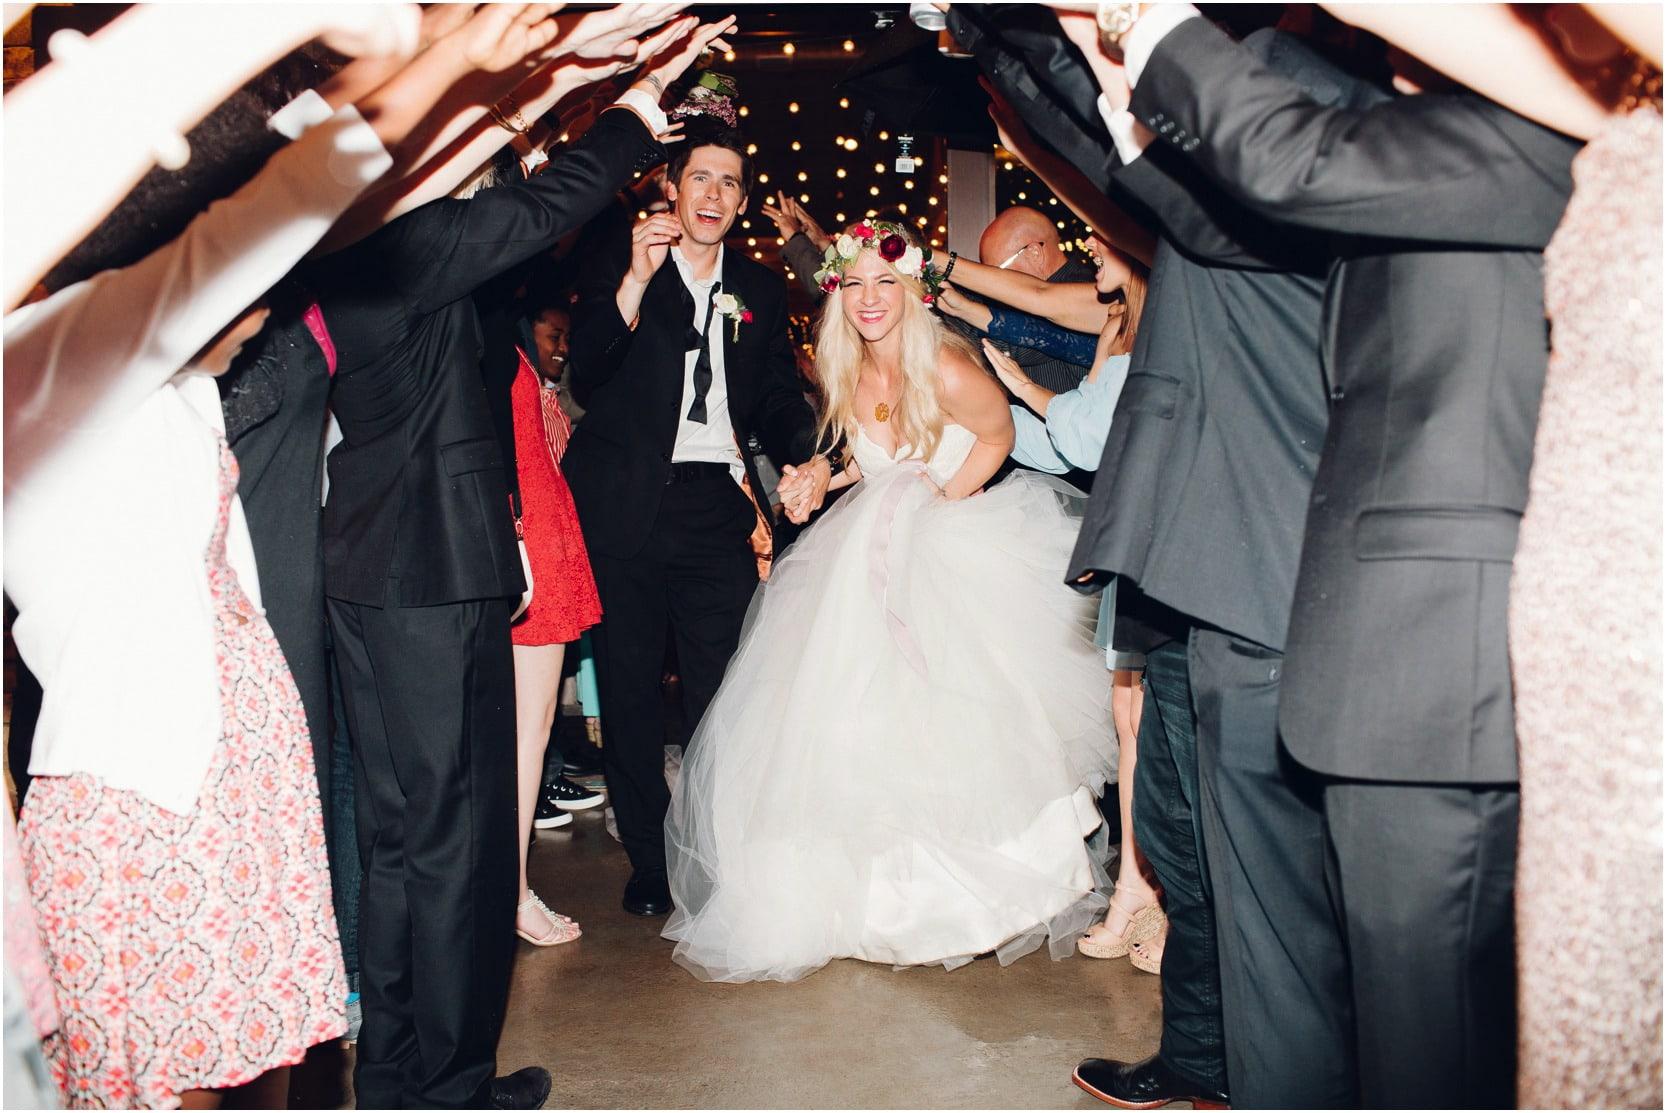 coderhillengburg_oklahoma_wedding__1274_blogstomped